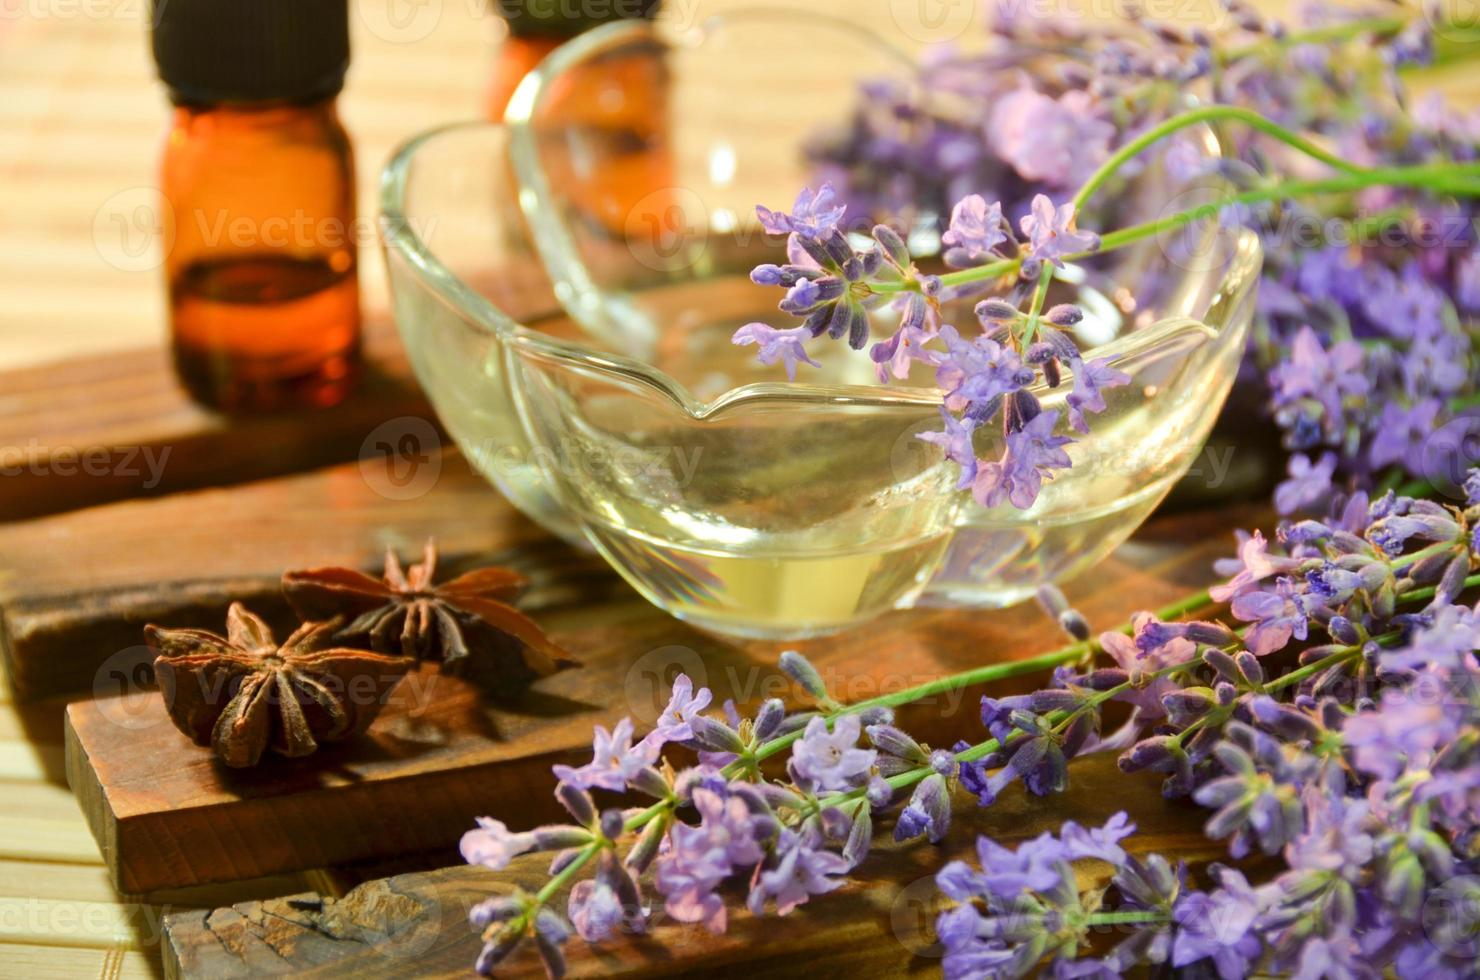 tratamiento de aromaterapia con lavanda foto